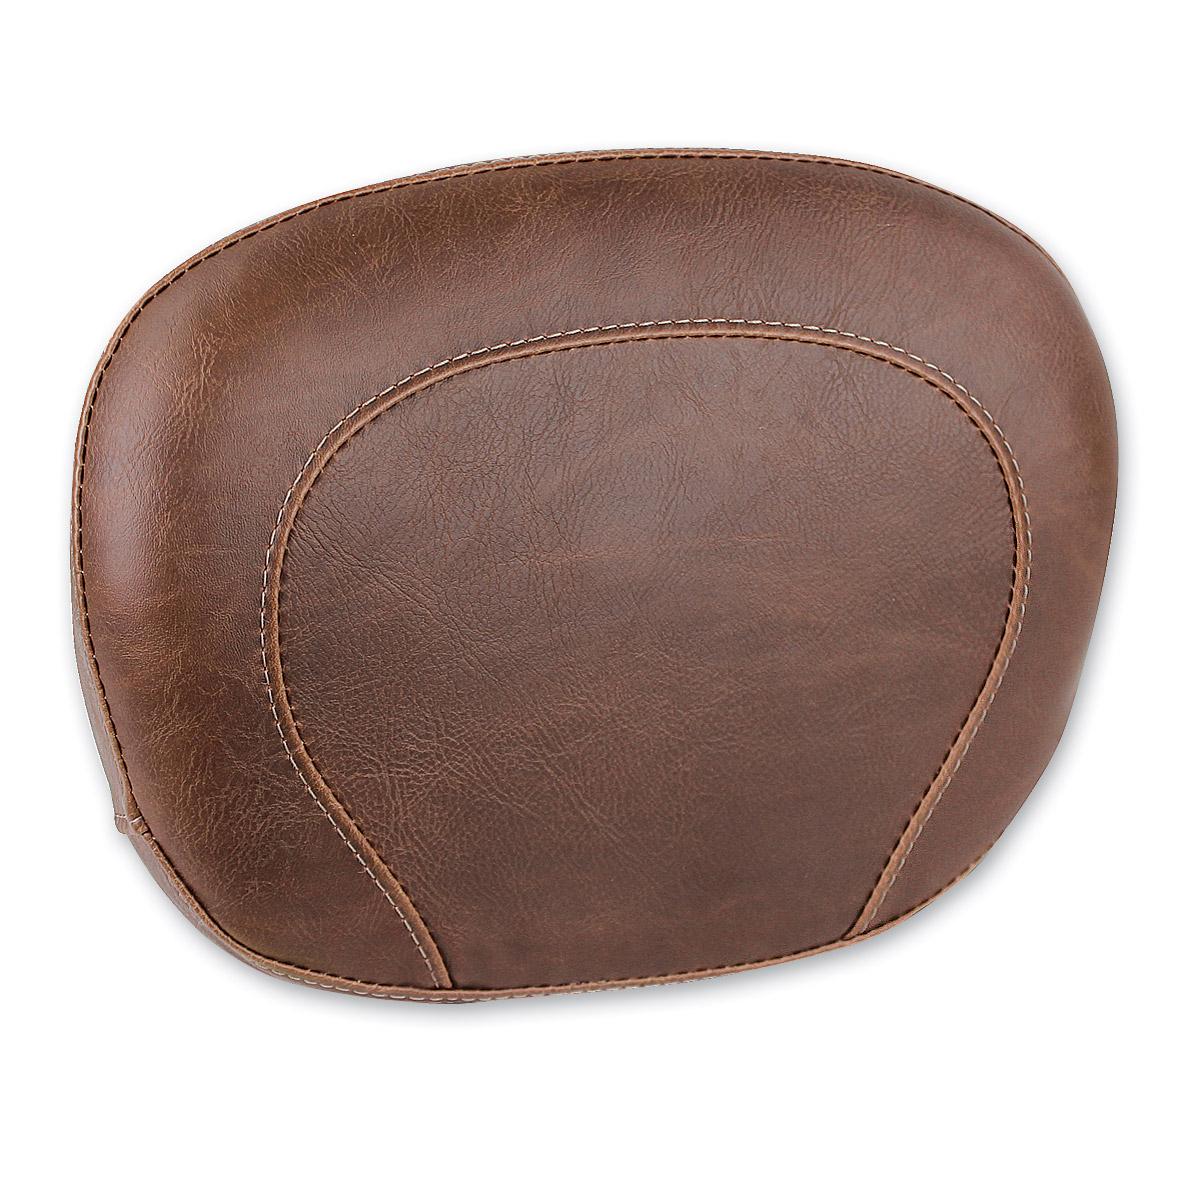 Mustang Brown Smooth Sissy Bar Pad